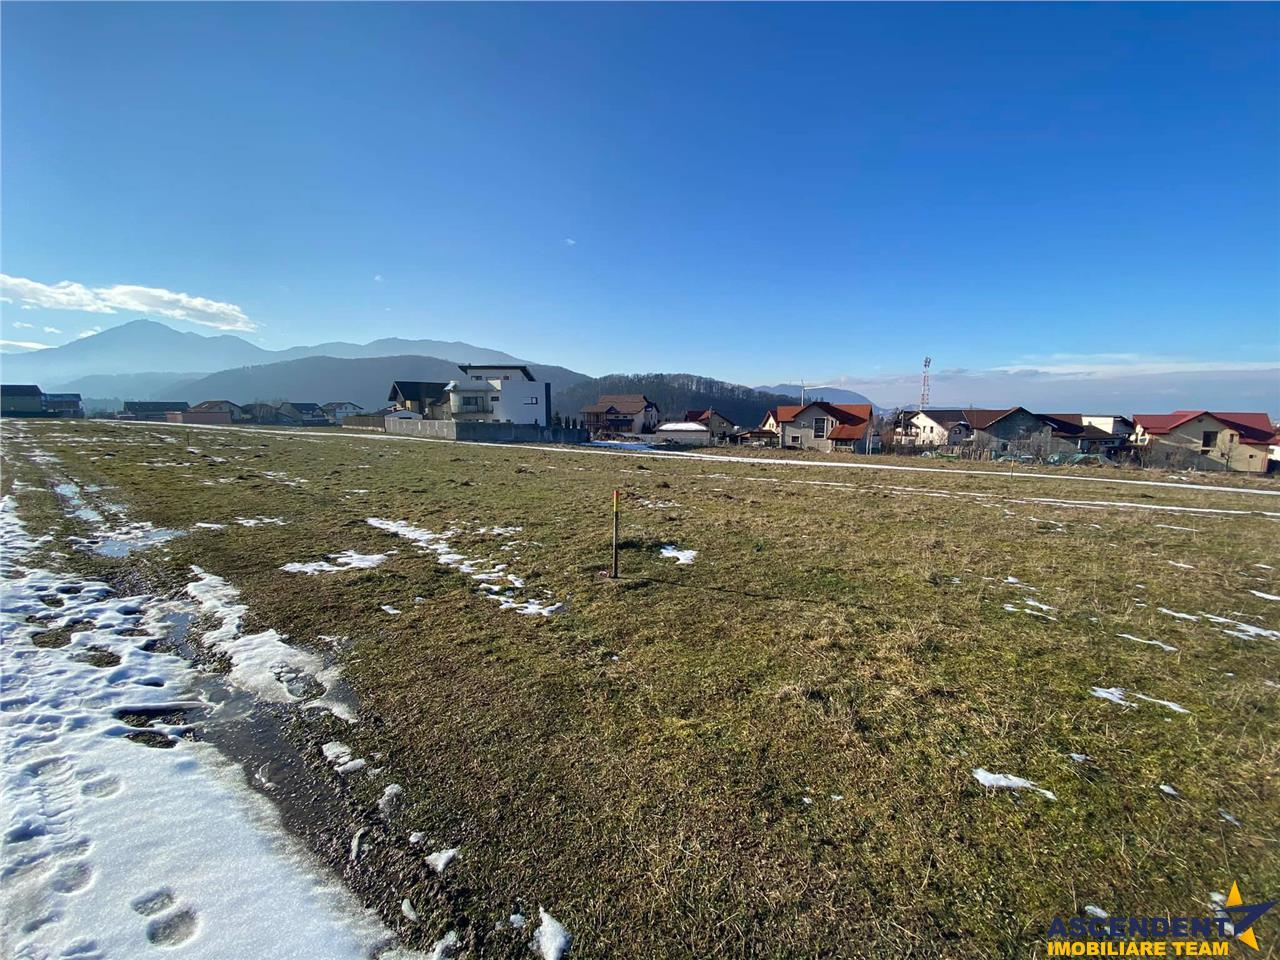 Peste 1.000 mp teren, Bunloc, cu vedere panoramica